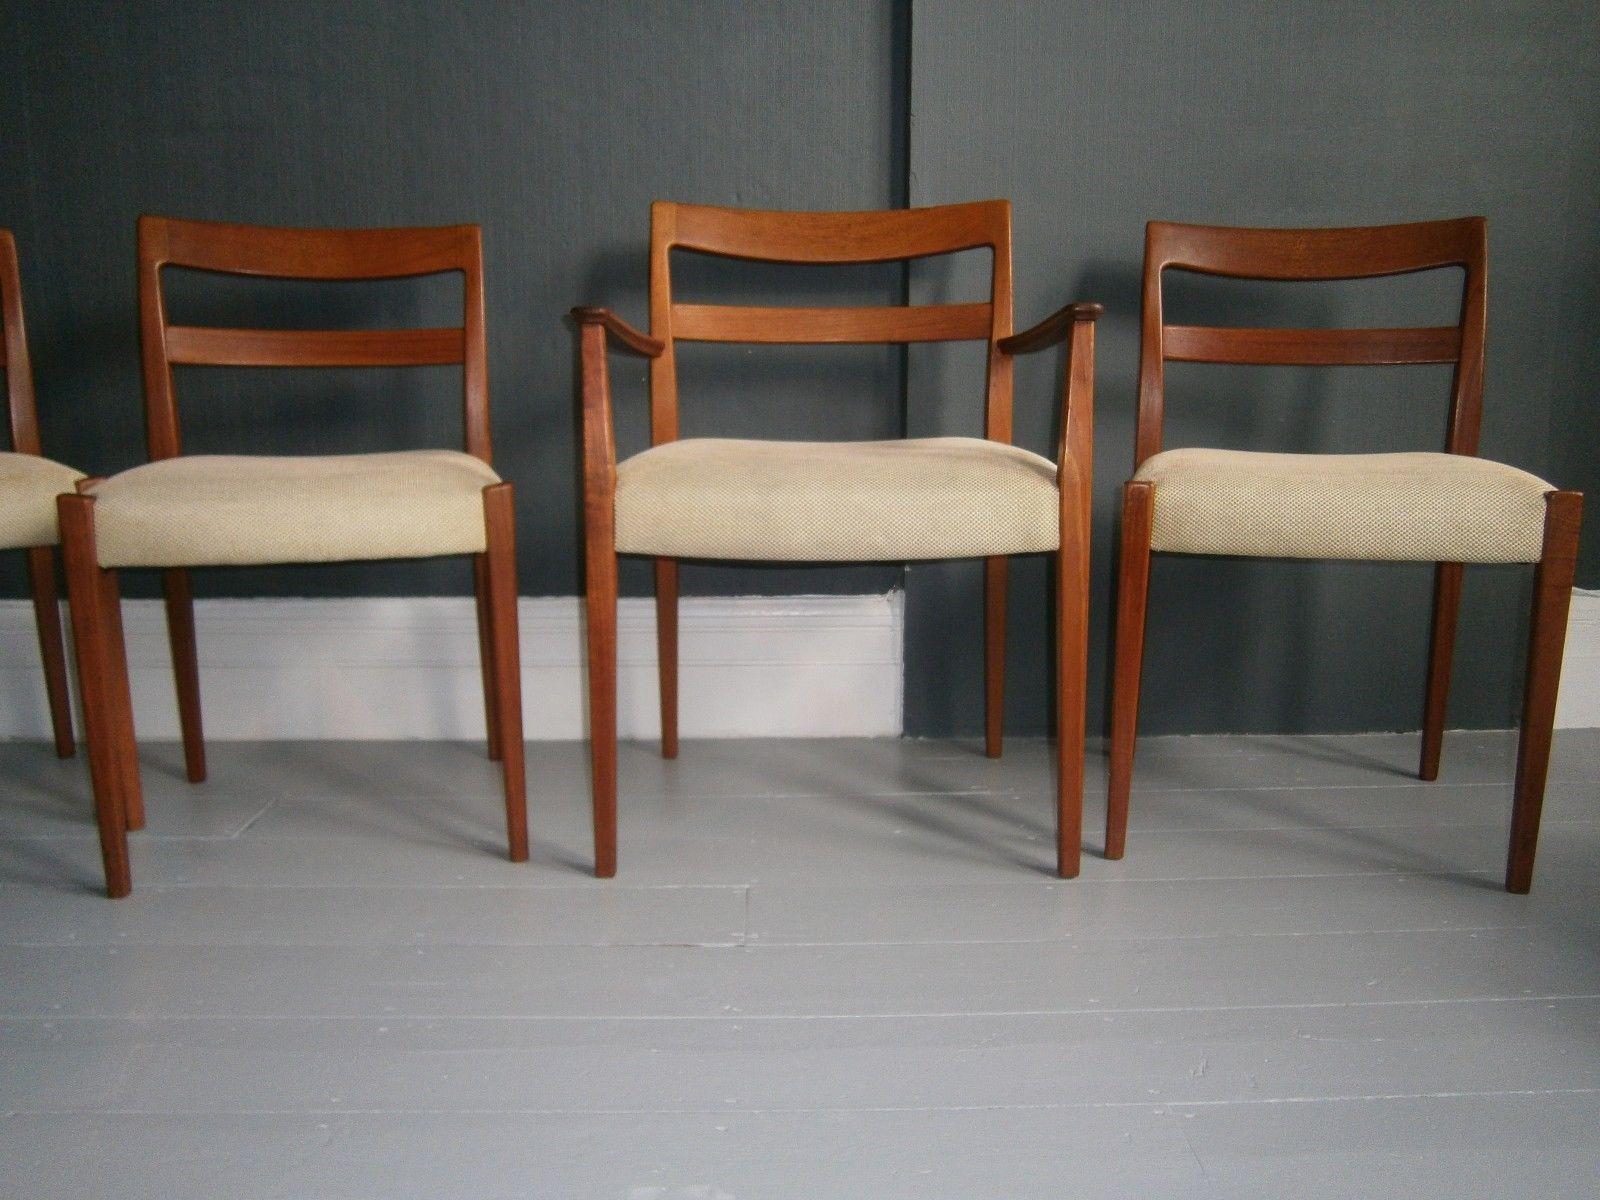 Diy Mid Century Modern Dining Table Mid Century Vintage Retro Troeds Garmi Dining Chairs Nils Jonsson